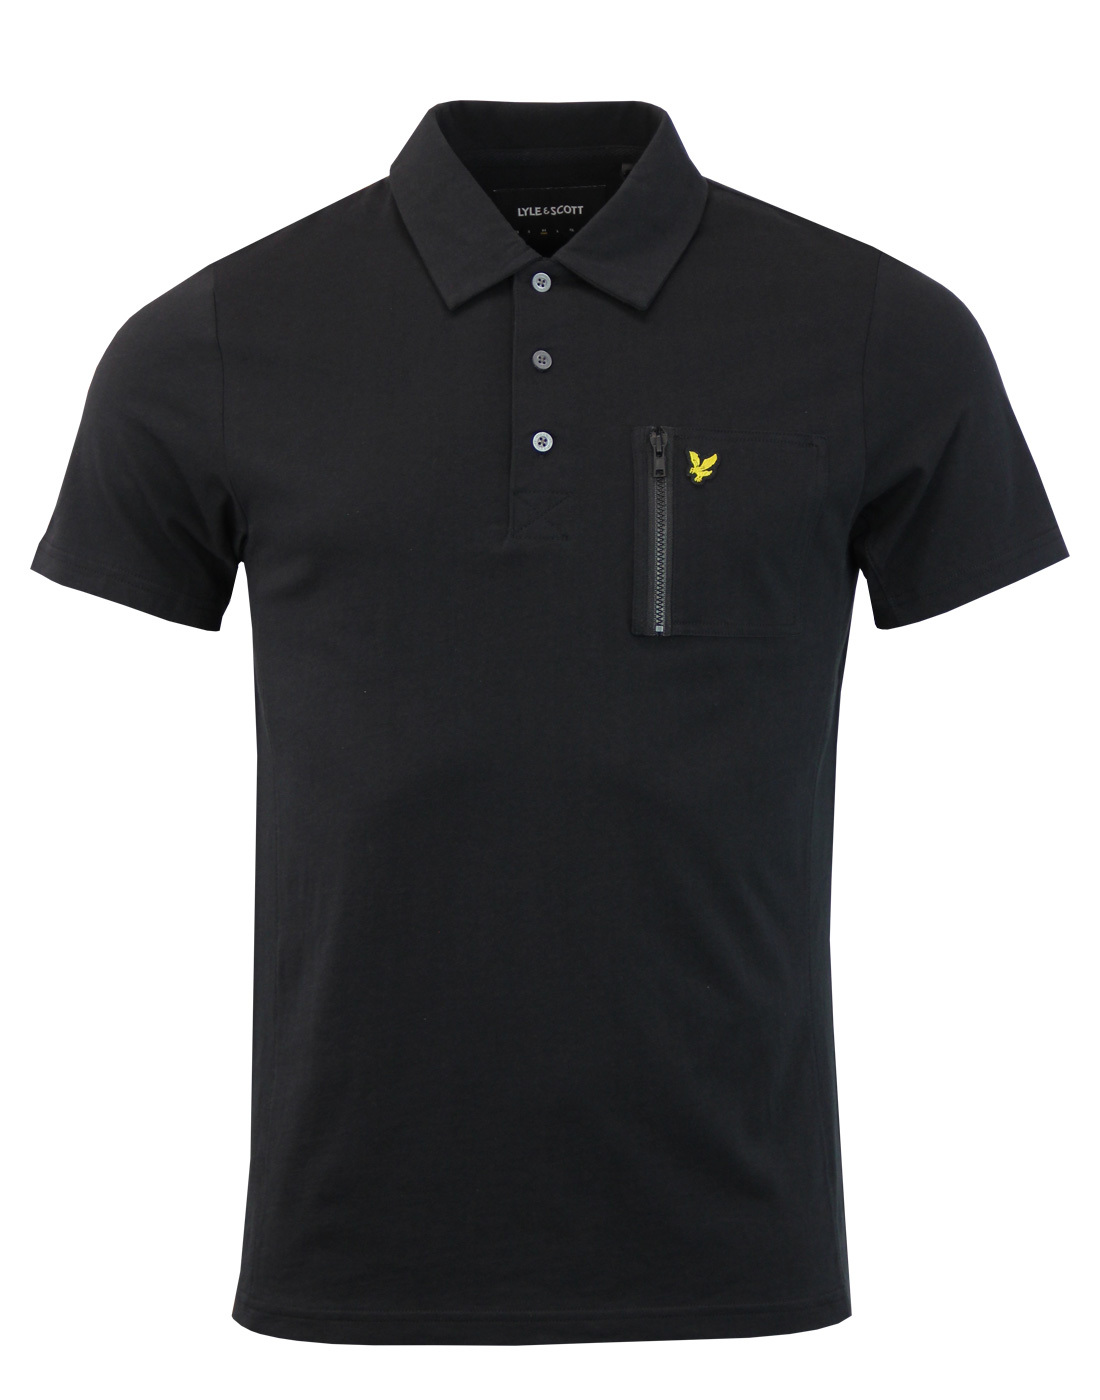 LYLE & SCOTT Retro Mod Zip Pocket Polo Shirt (TB)